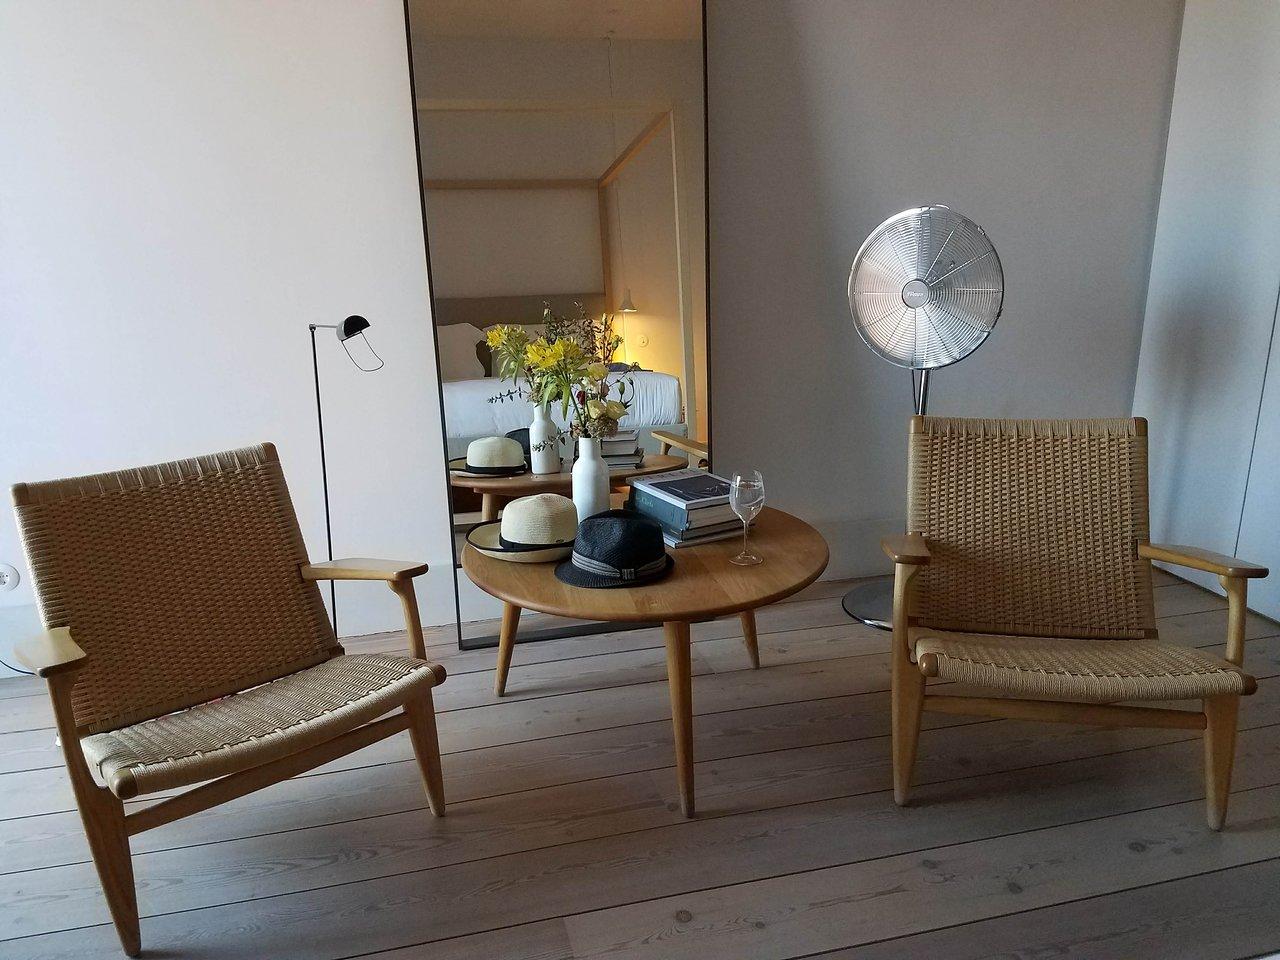 Santa Clara 1728 : Santa clara updated specialty hotel reviews lisbon